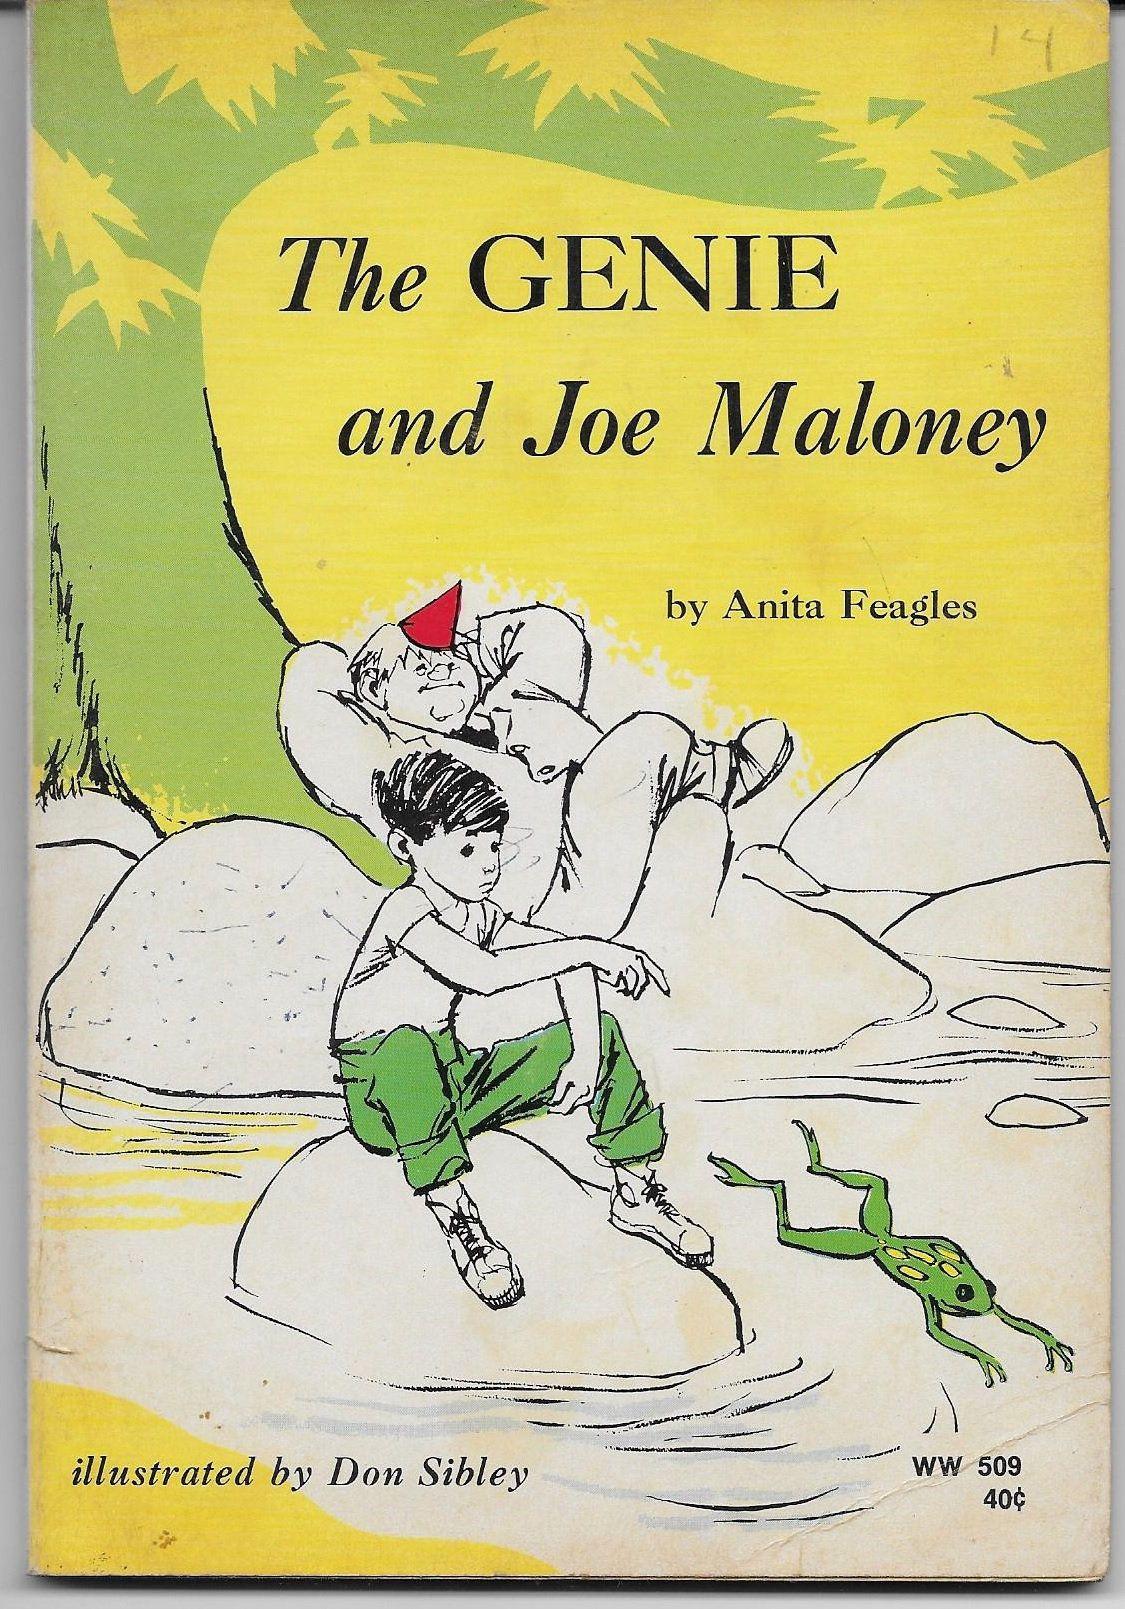 The Genie And Joe Maloney Anita Feagles 1962 Reading Gift Etsy In 2020 Reading Gift Basket Reading Gifts Vintage Book